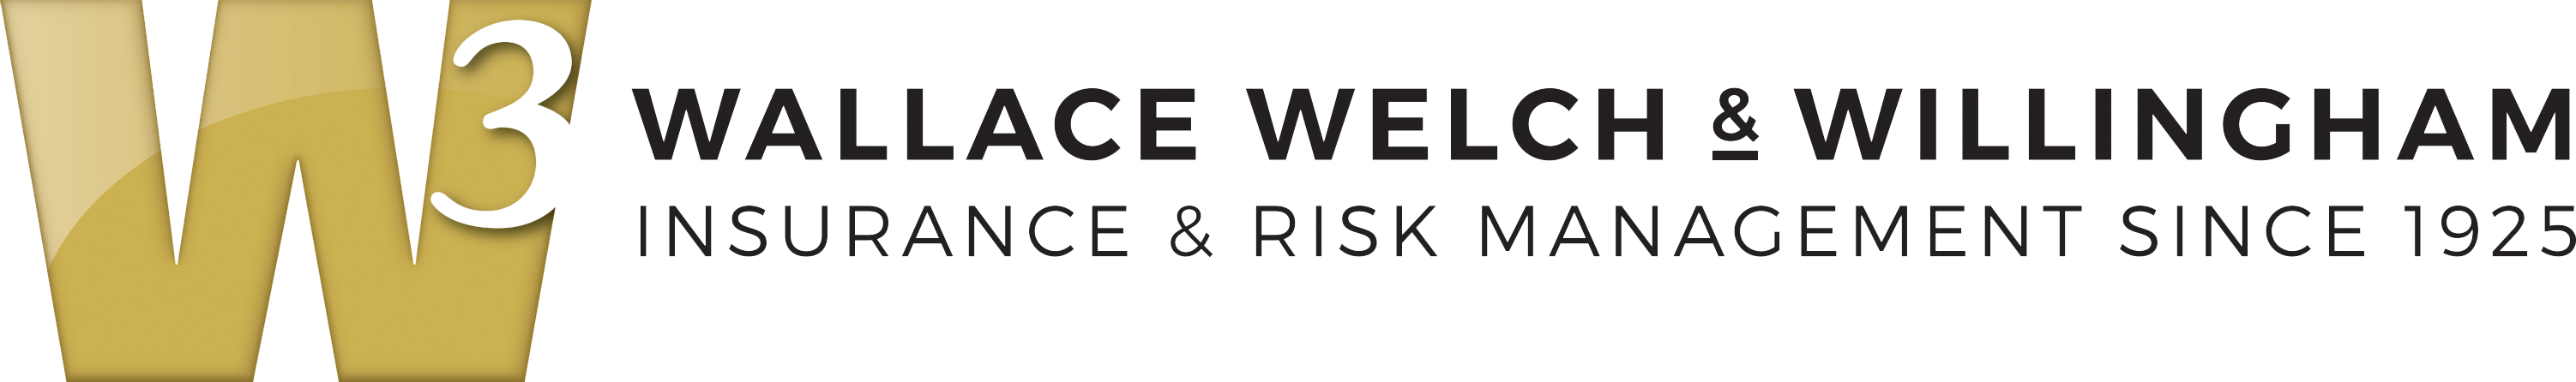 W3 Wide Logo Transparent.png